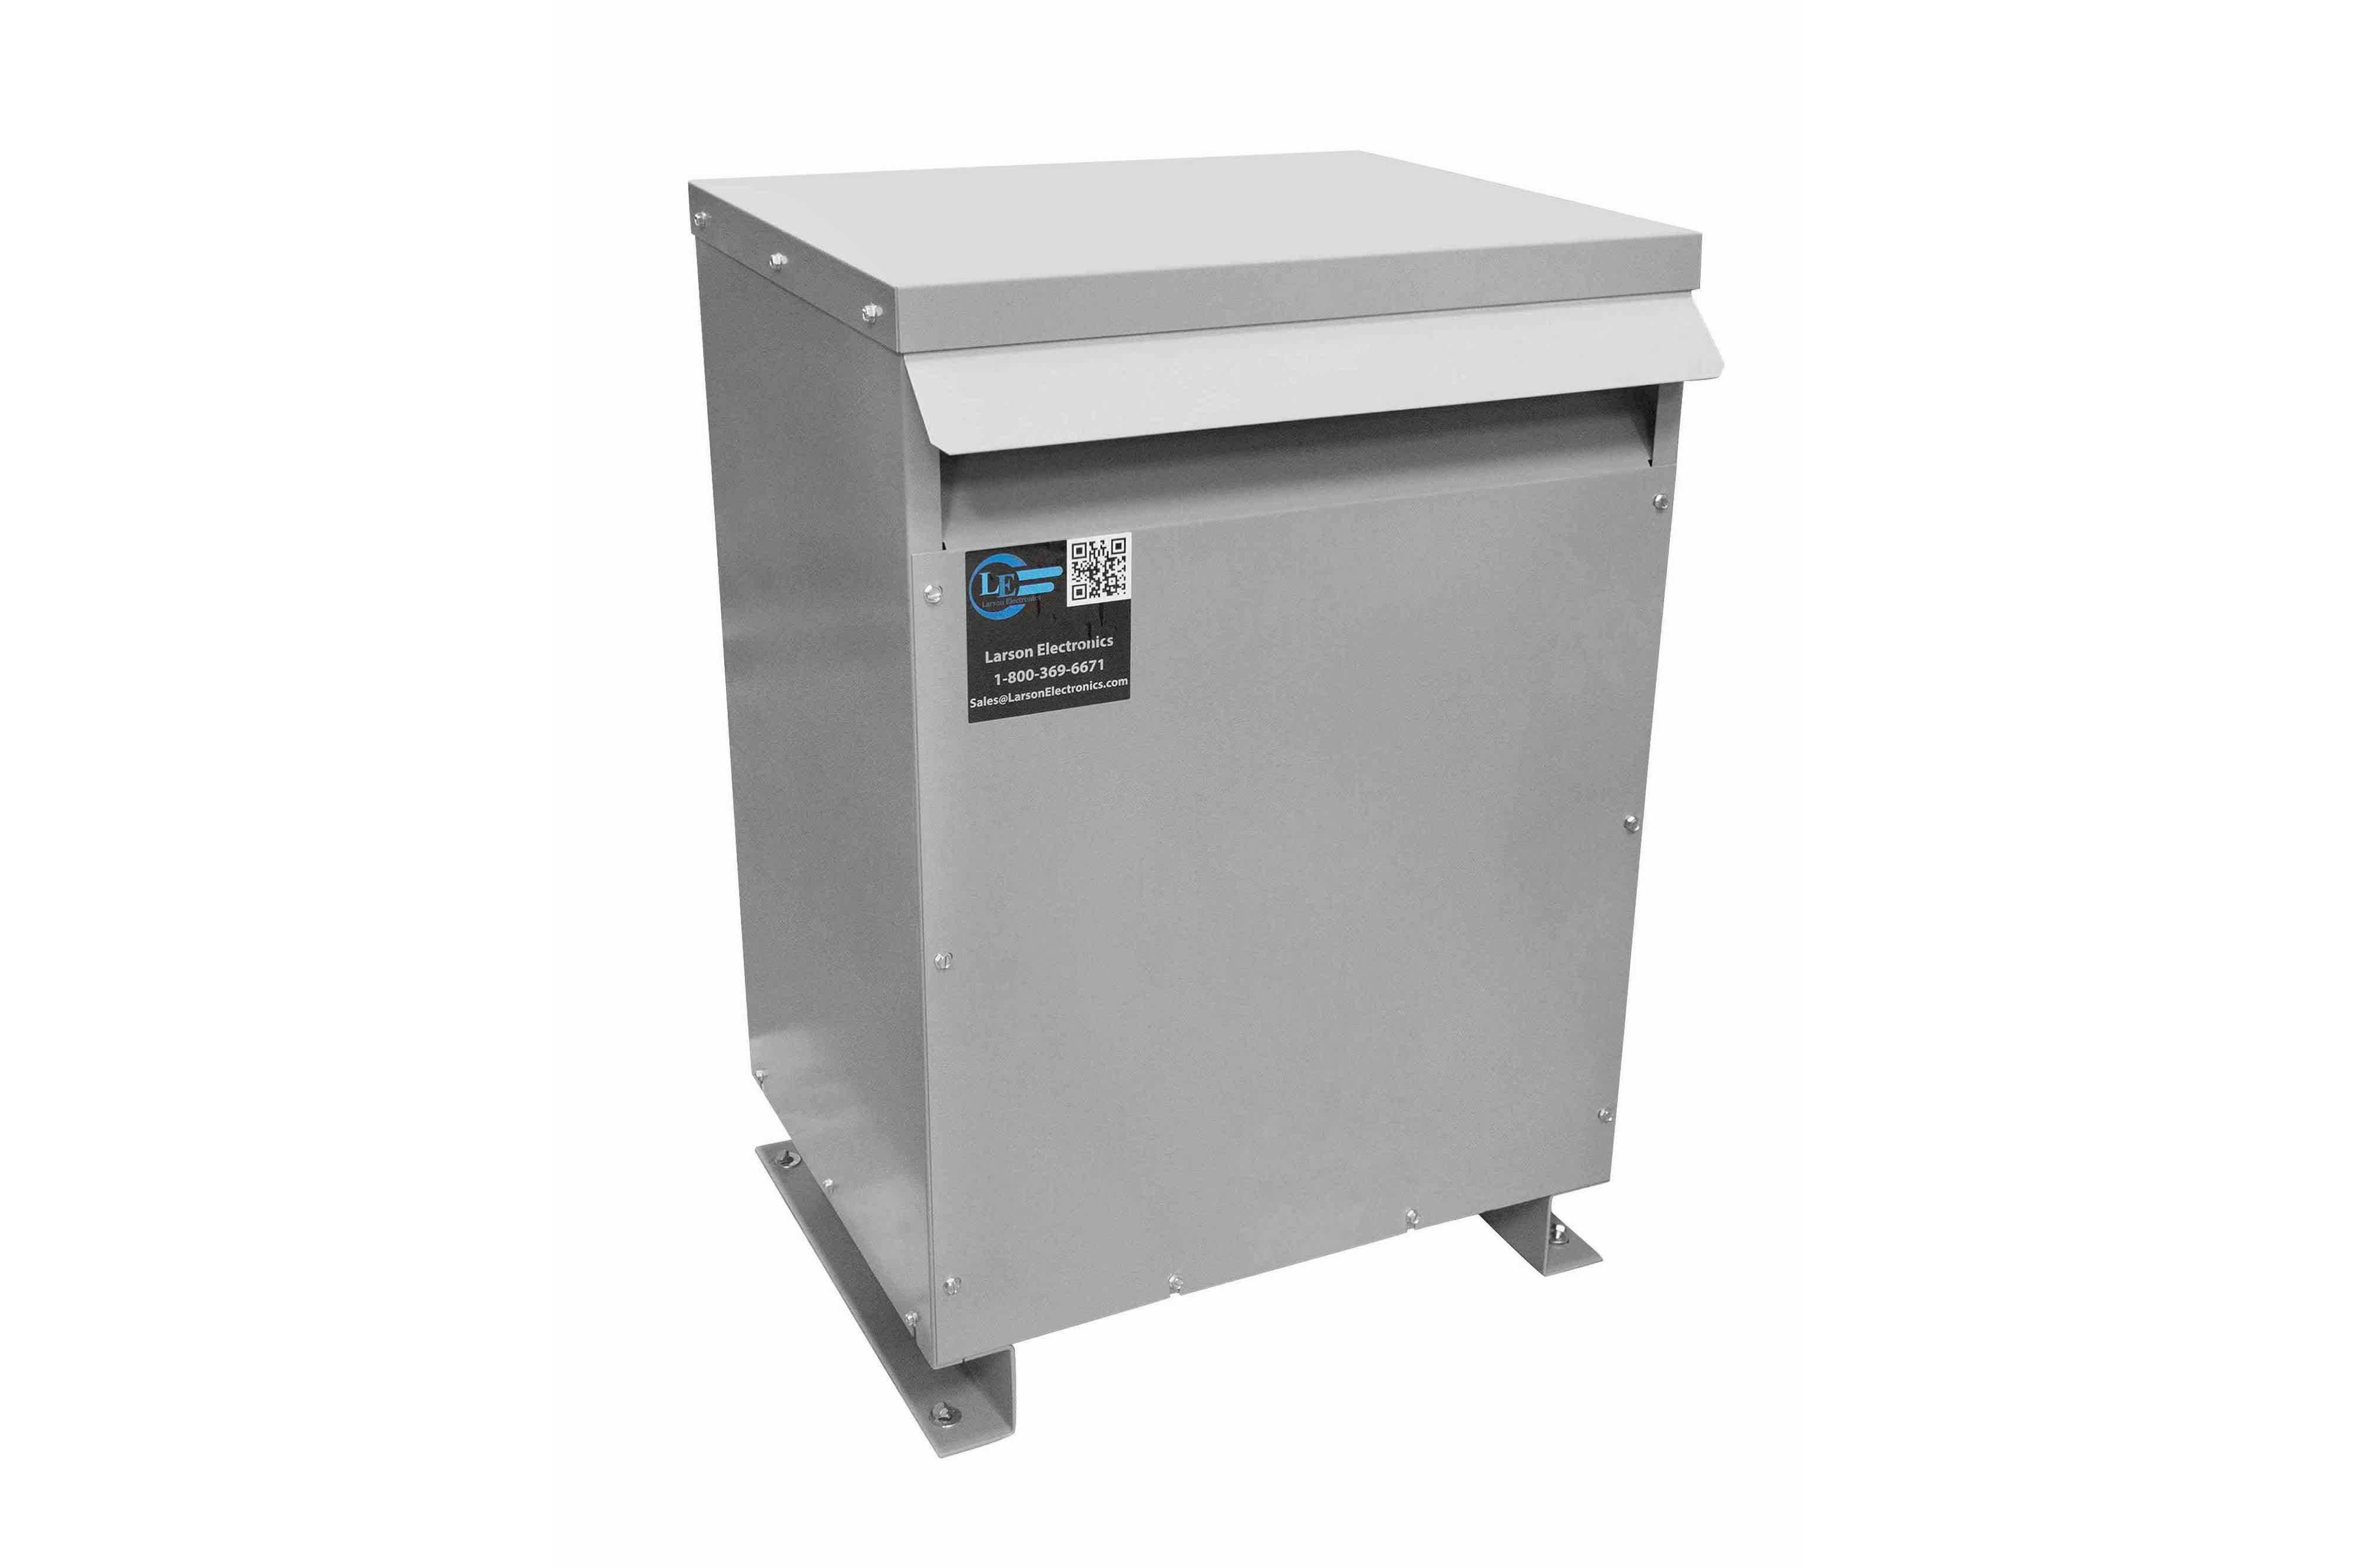 90 kVA 3PH Isolation Transformer, 480V Wye Primary, 400V Delta Secondary, N3R, Ventilated, 60 Hz